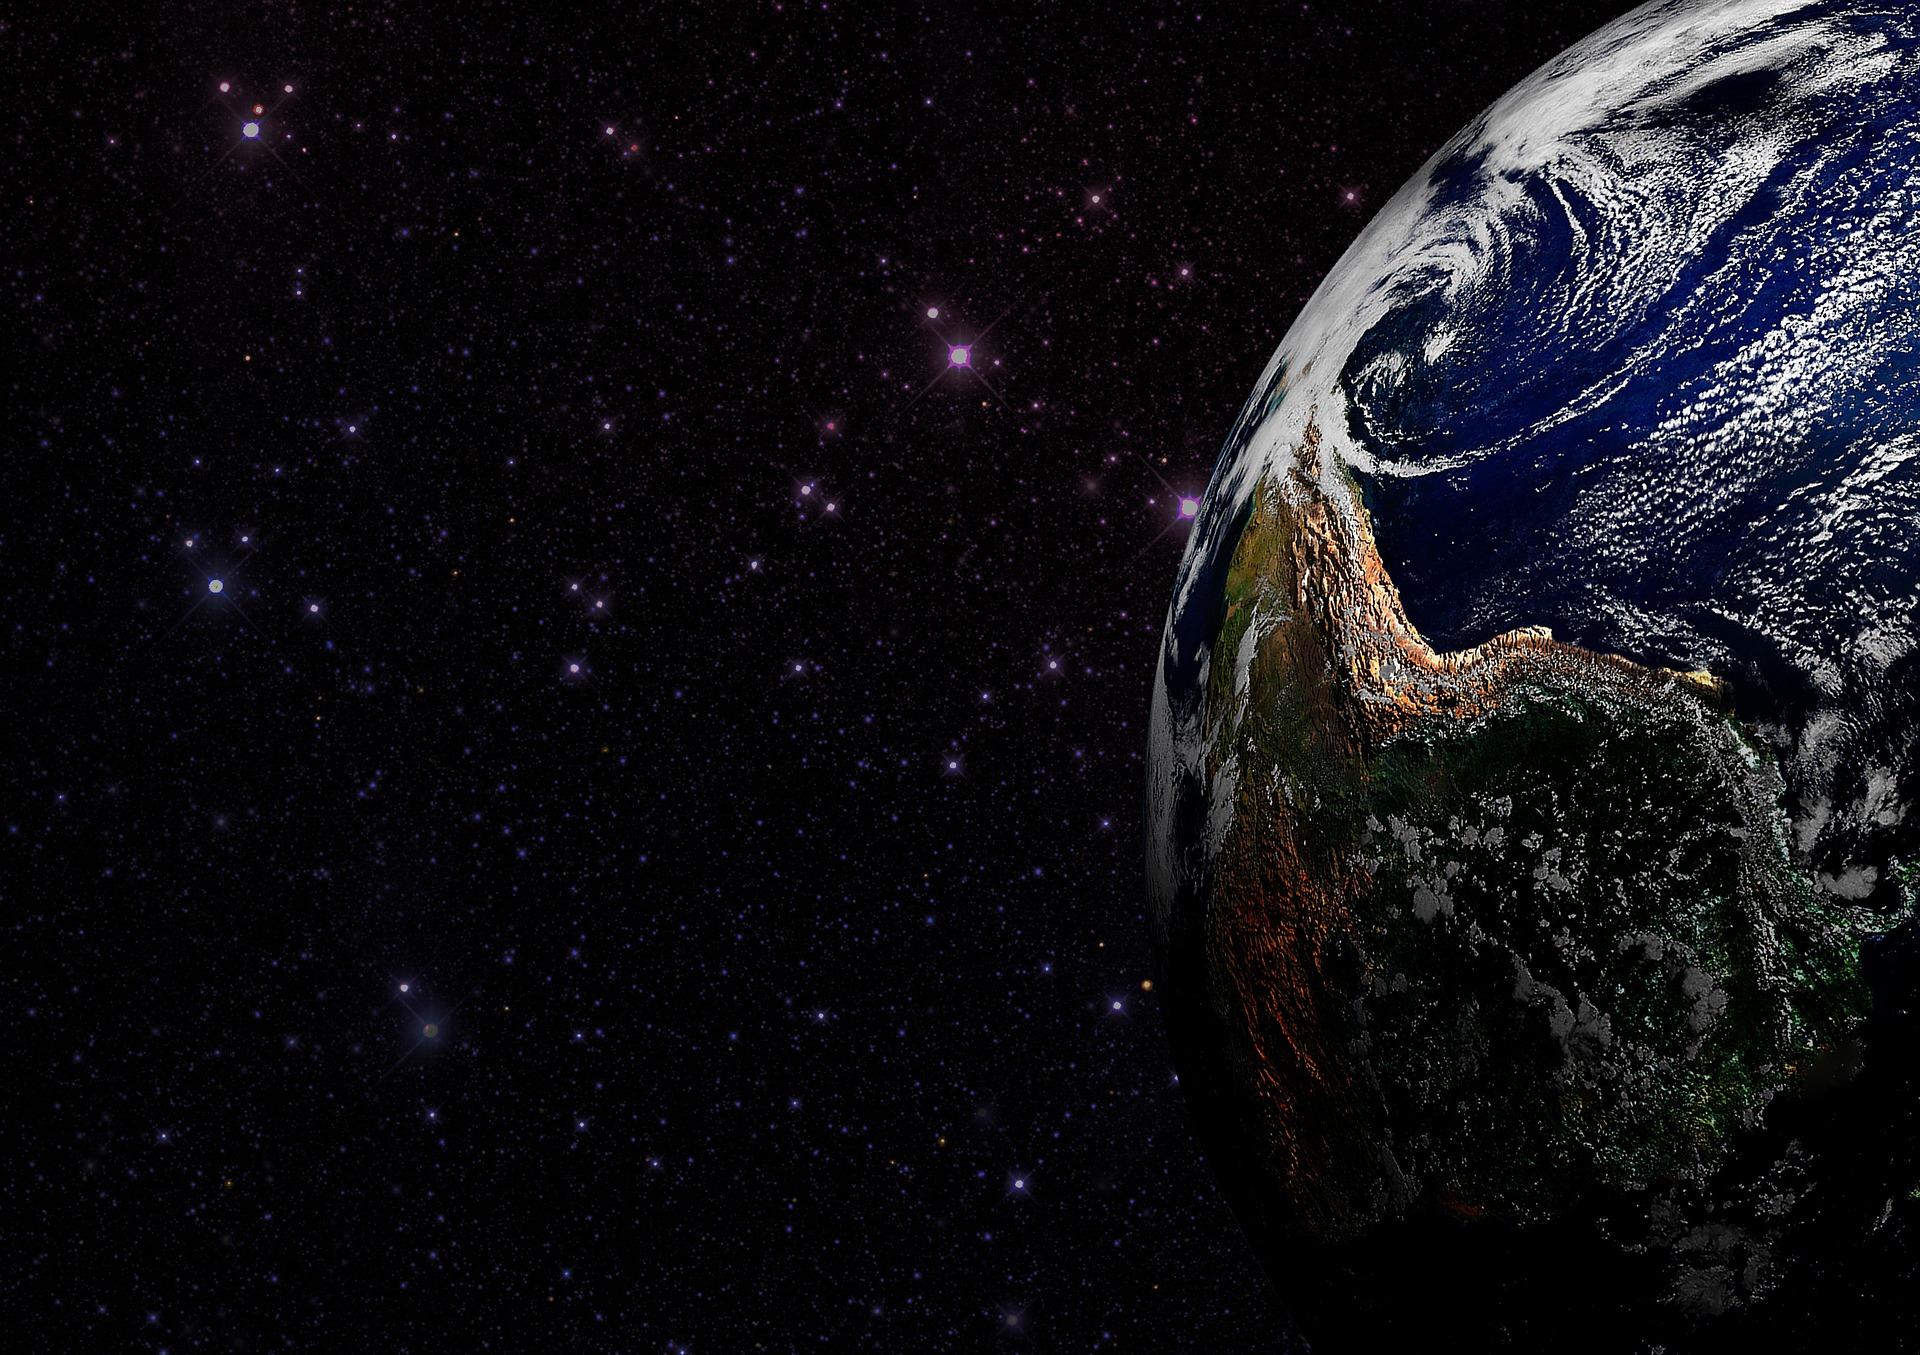 Telenor Satellite steers the course of future satellite communications